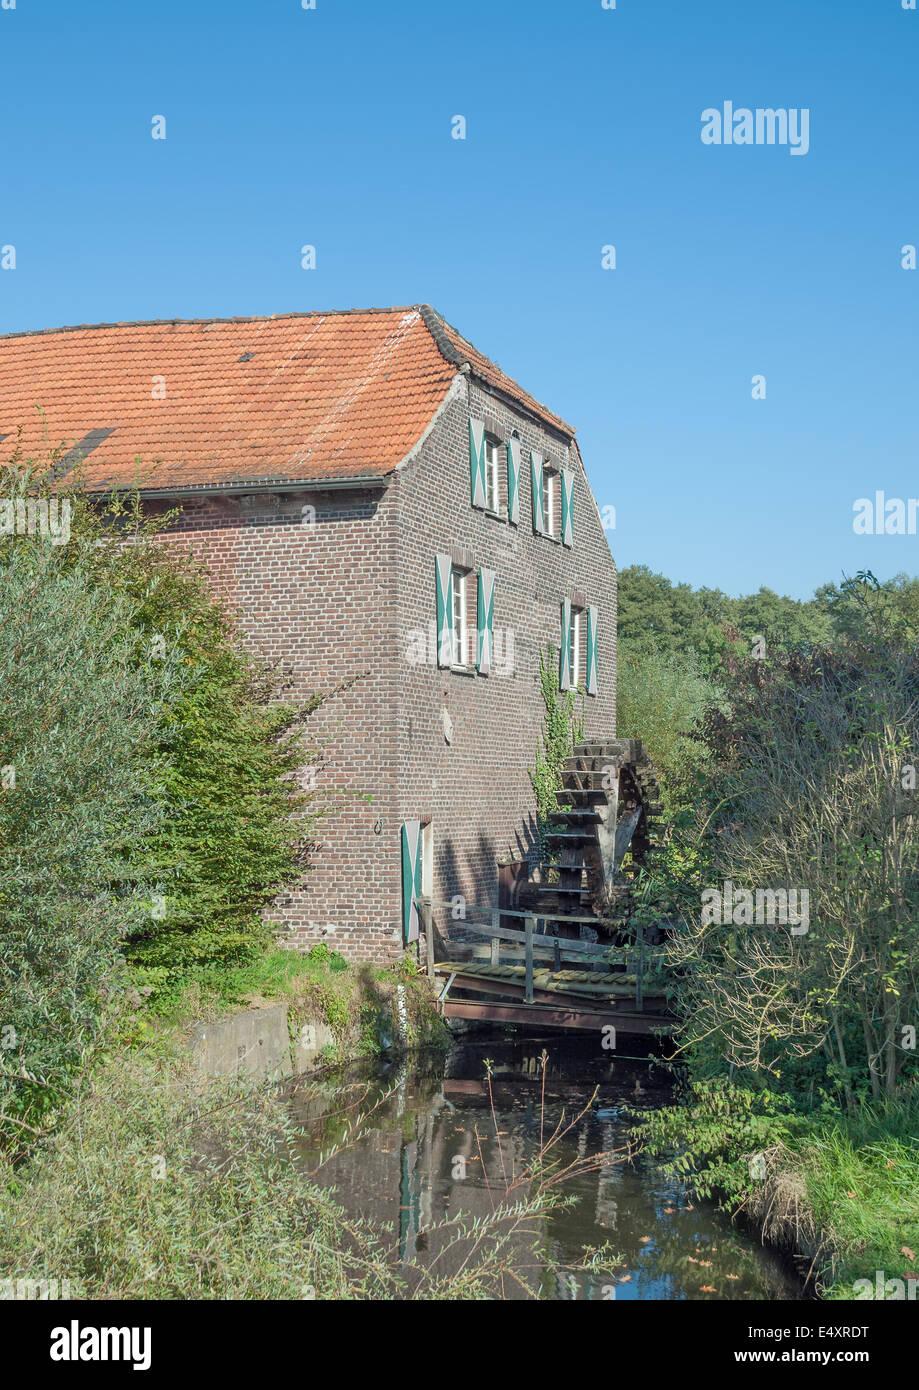 Watermill Leuther Muehle,Rhineland,Germany - Stock Image